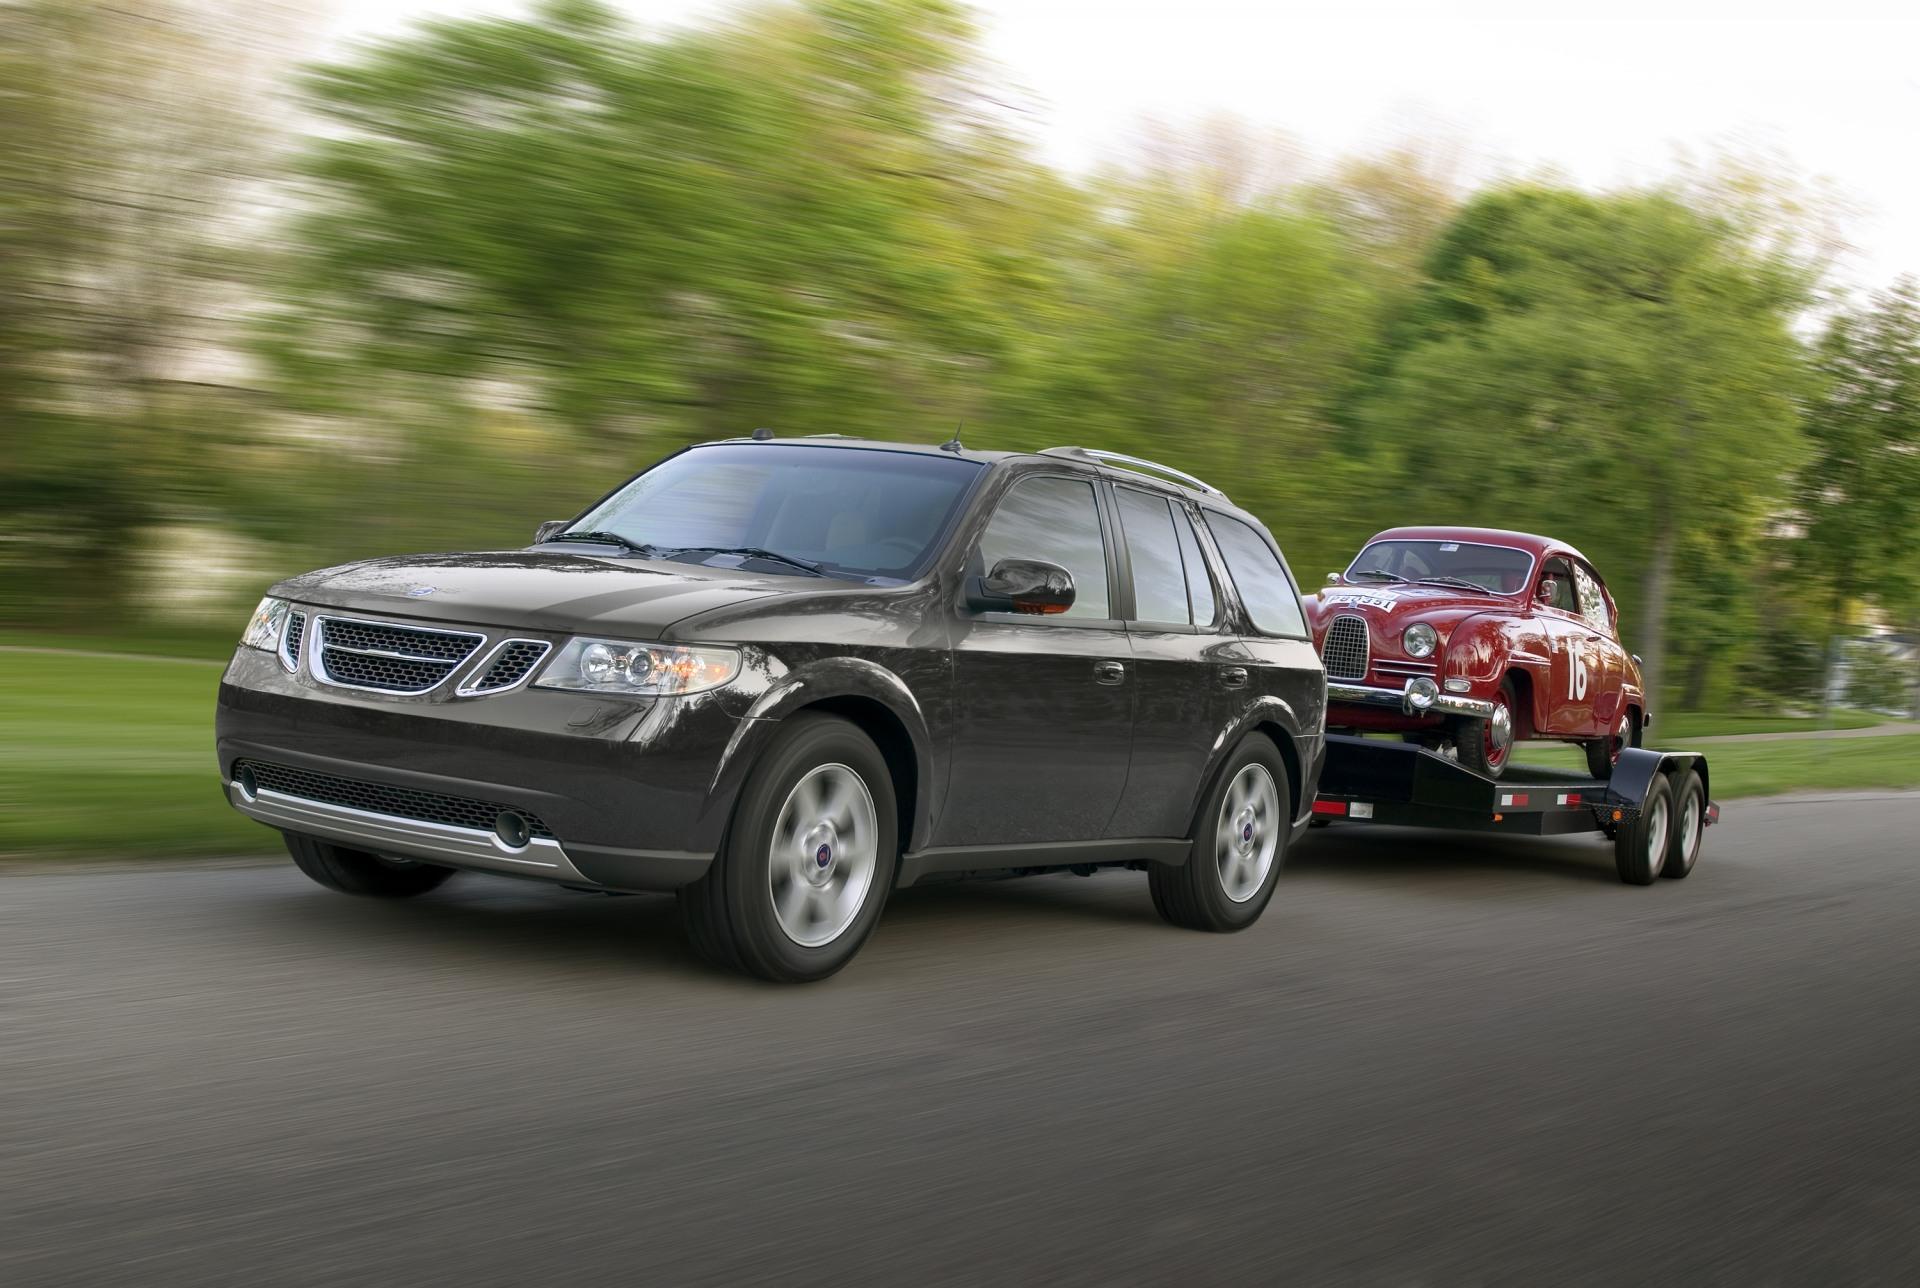 2009 Saab 9 7X News And Information